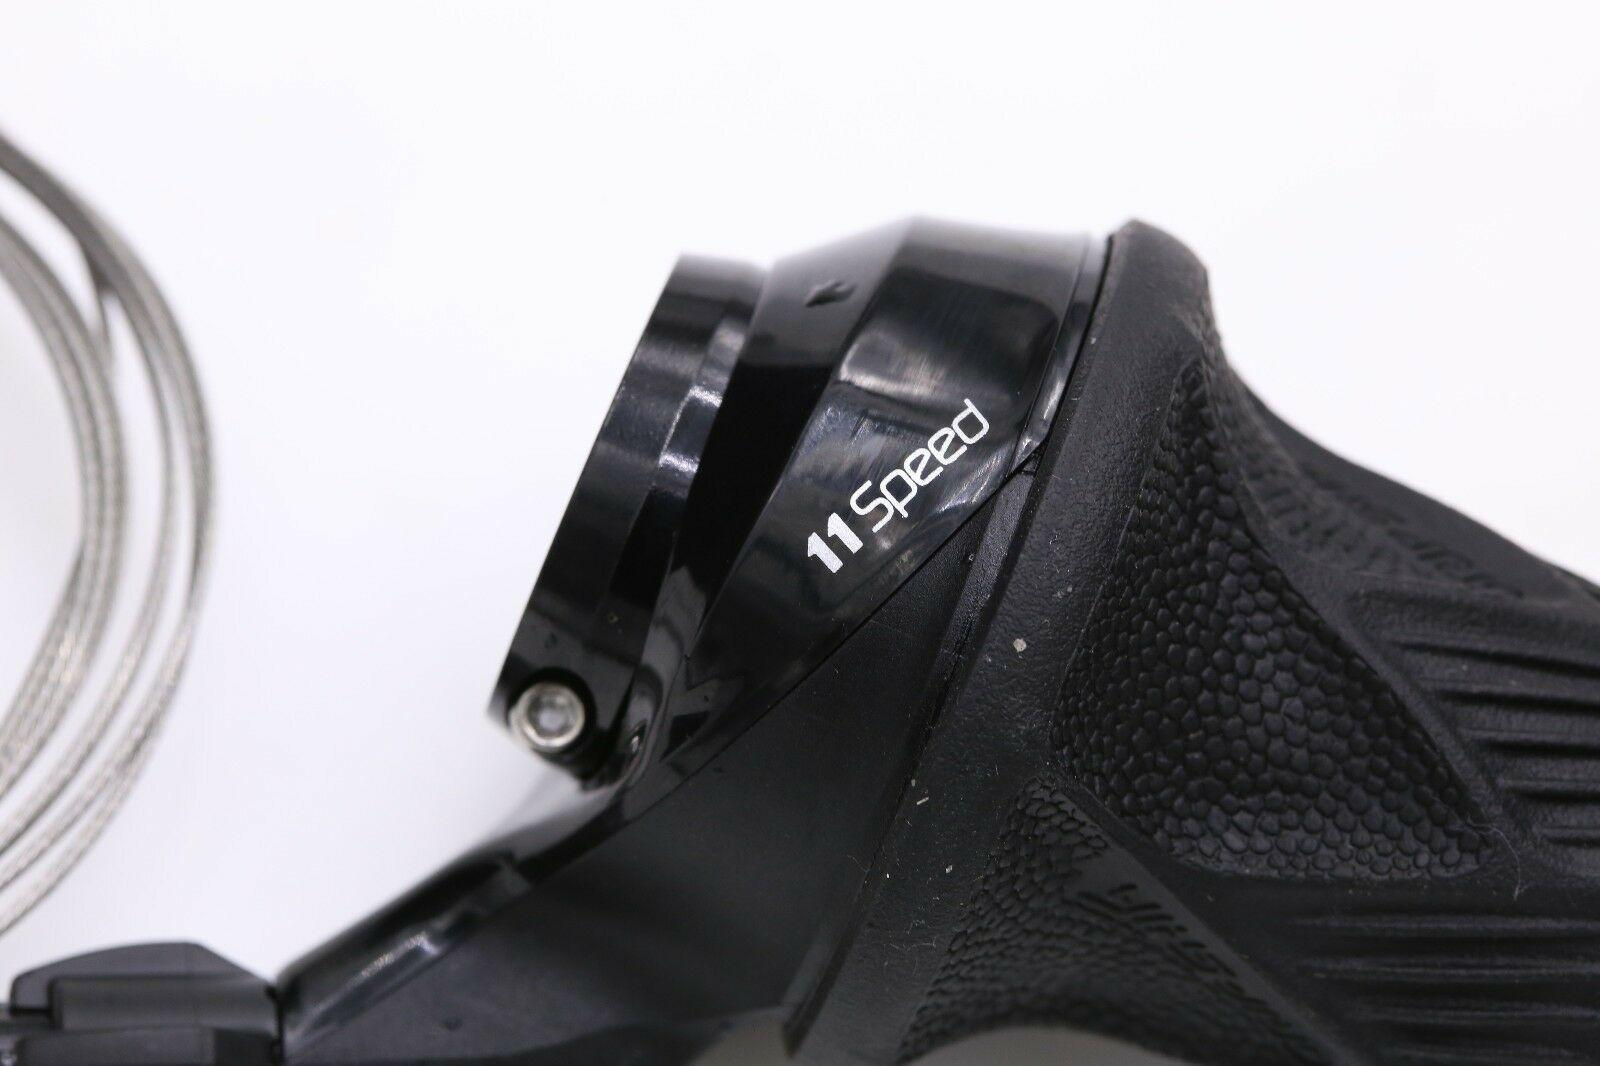 SRAM GX 11 Speed Grip Twist Rear Right Shifter With Locking Grip